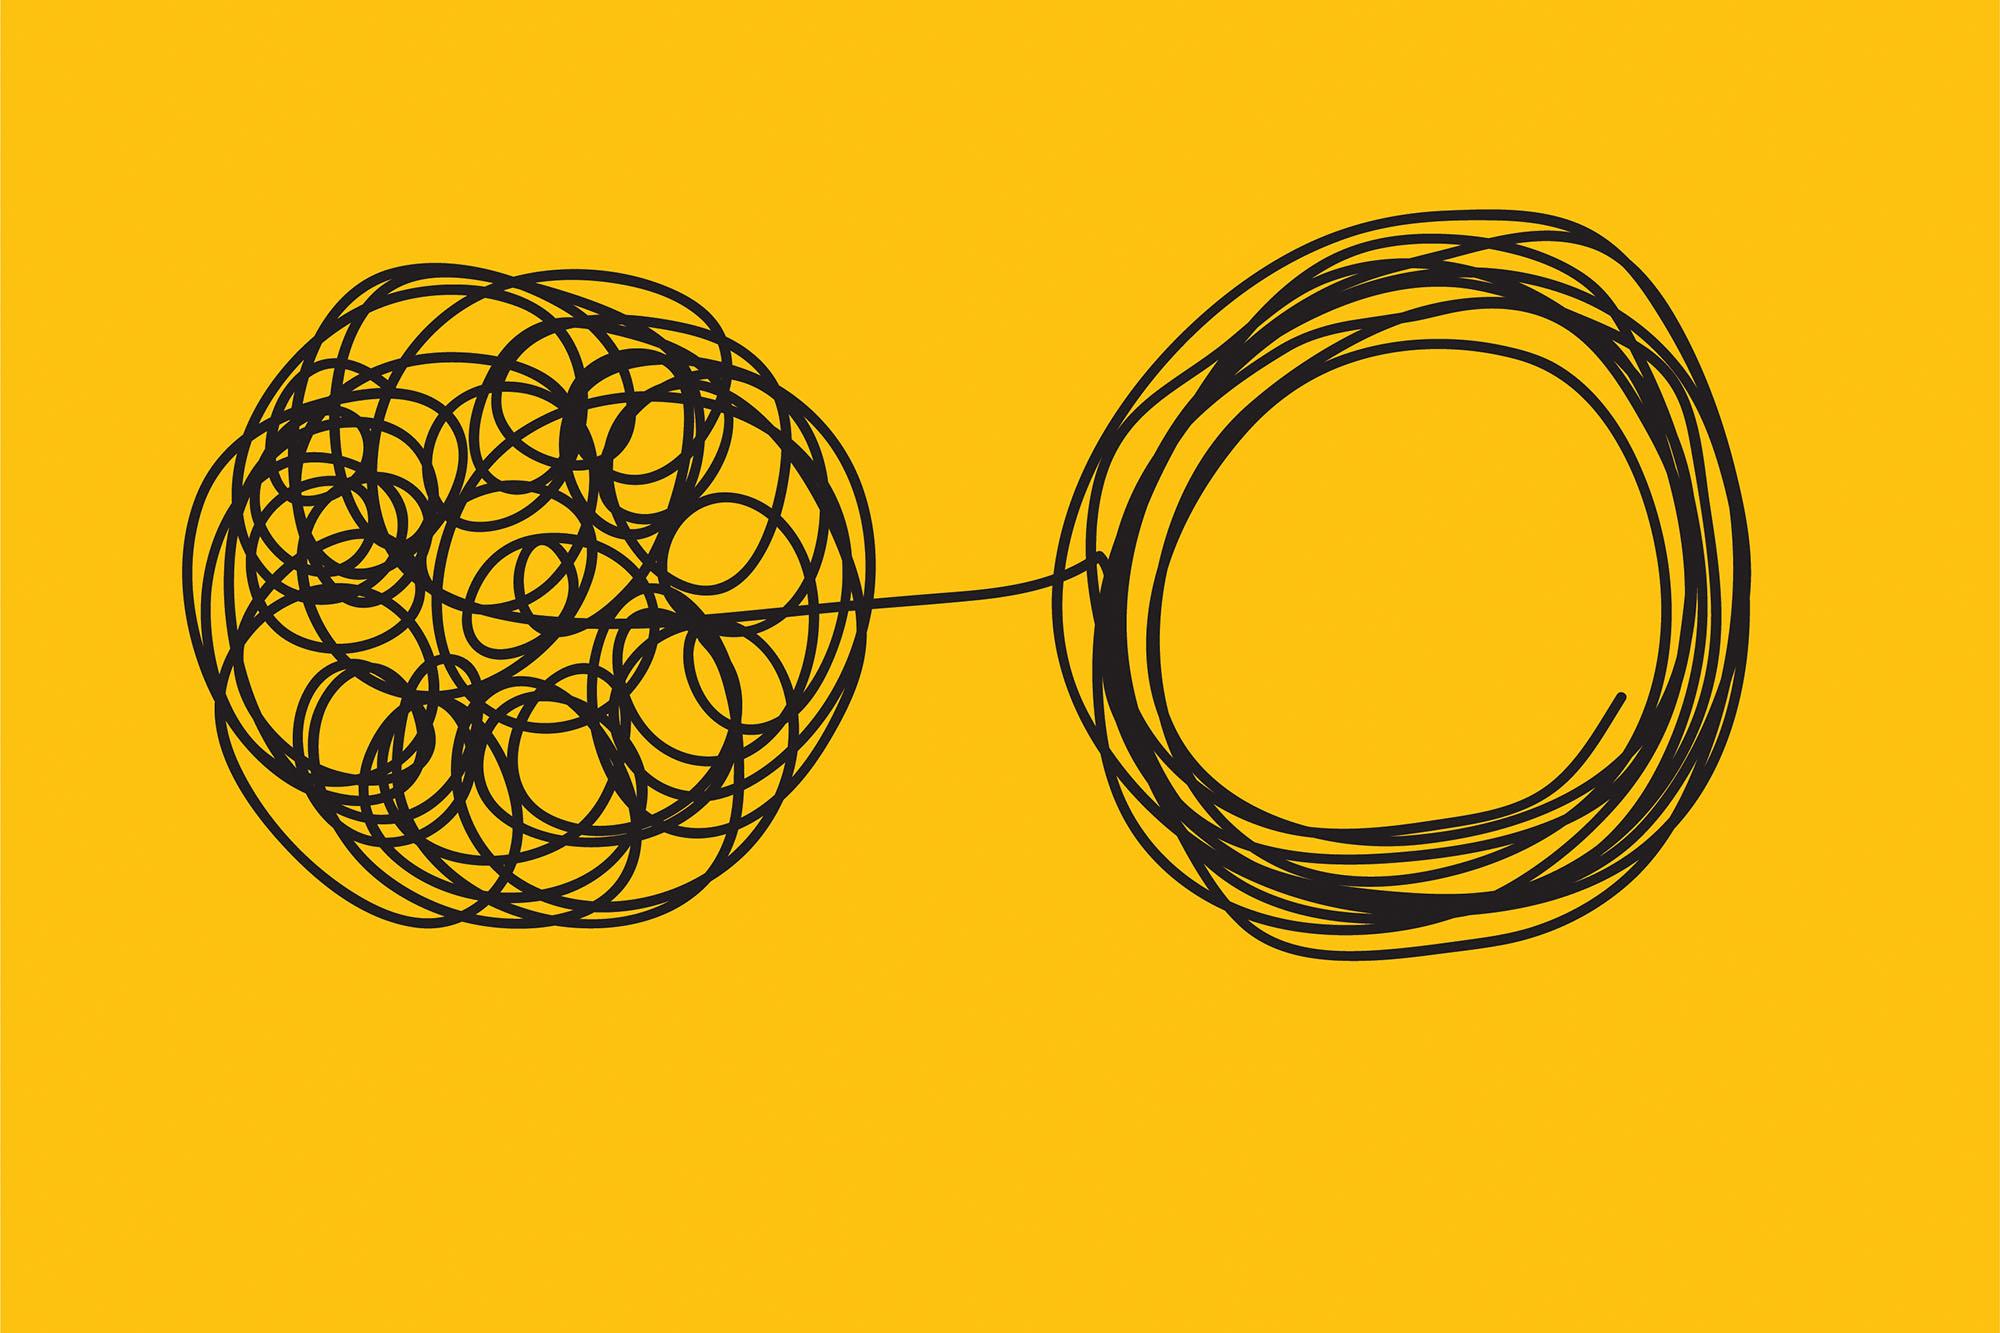 Untangling threads